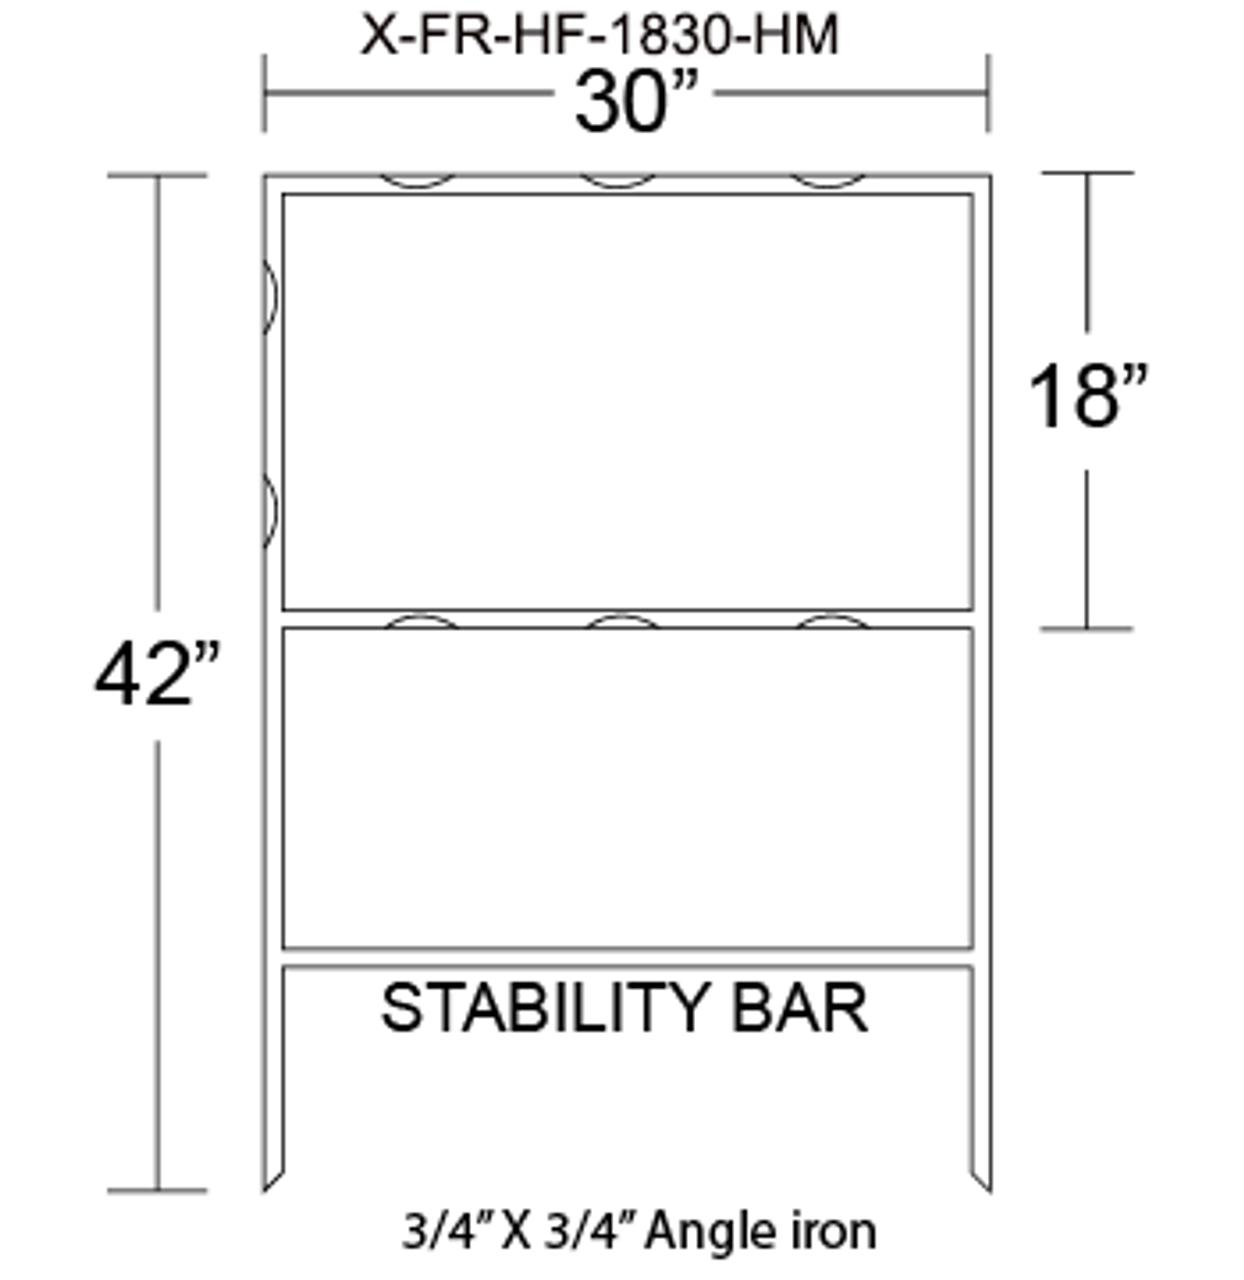 X-FR-HF-1830-HM